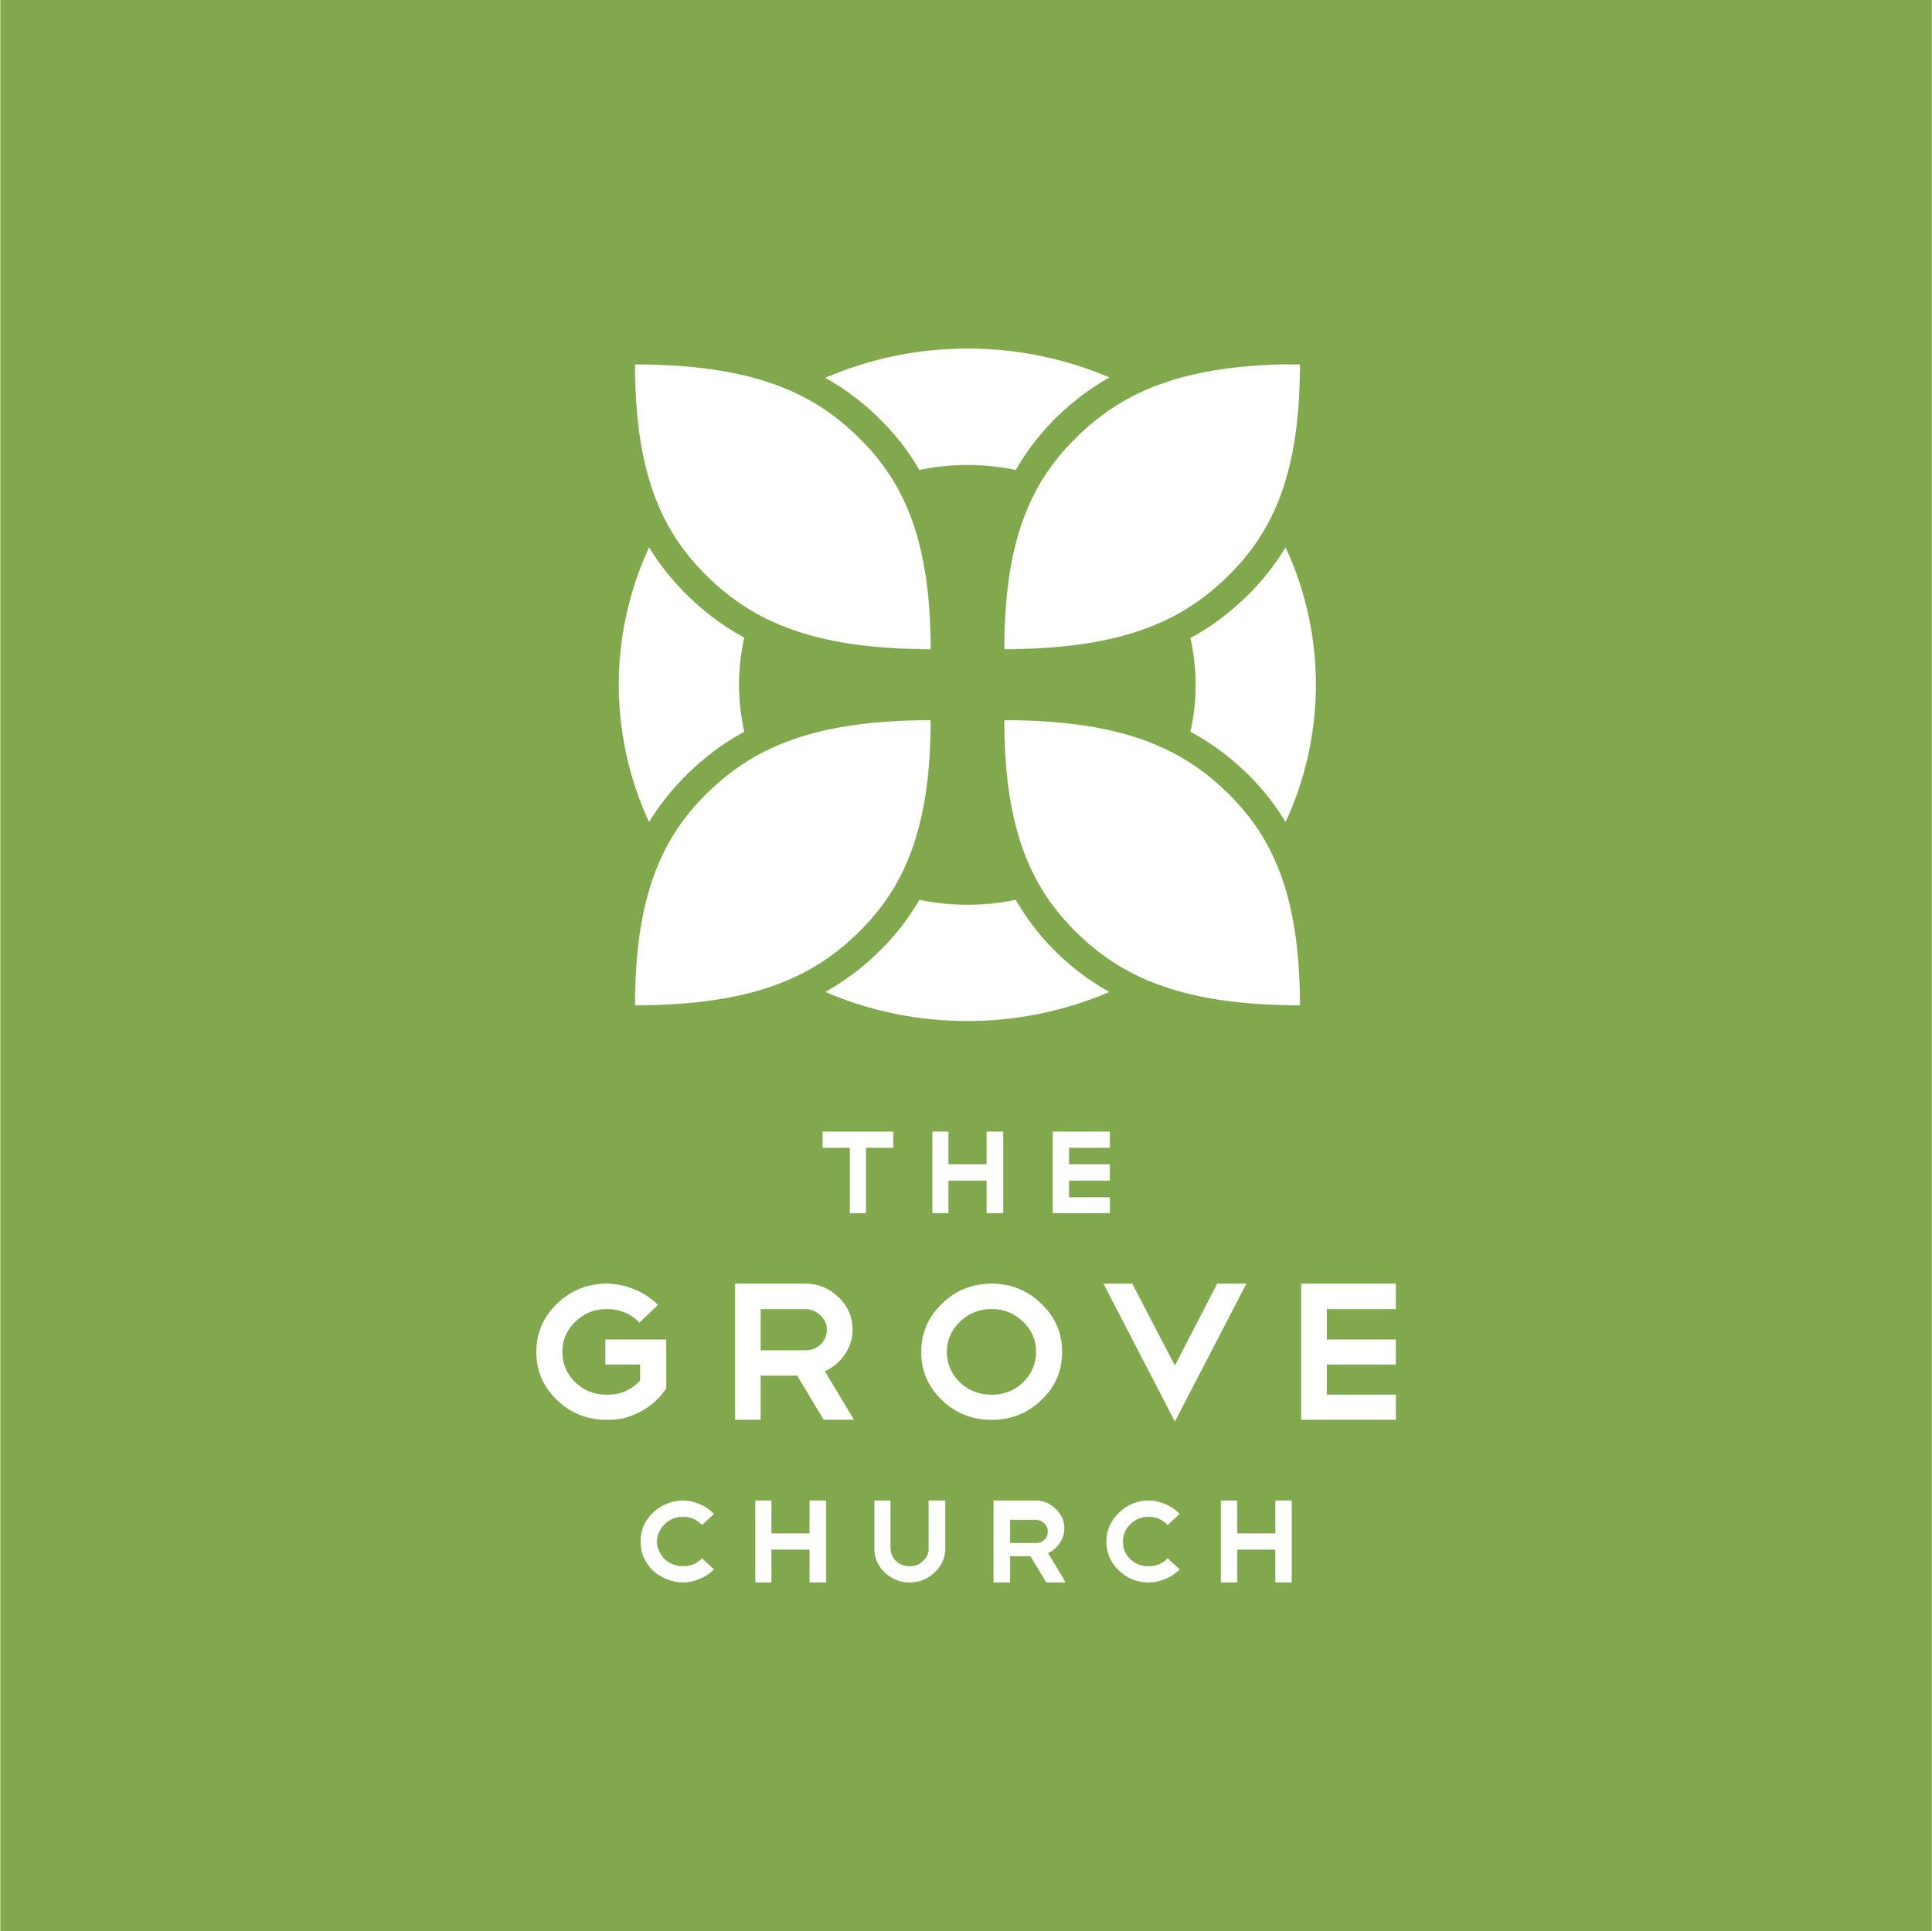 The Grove Church Logo.jpg